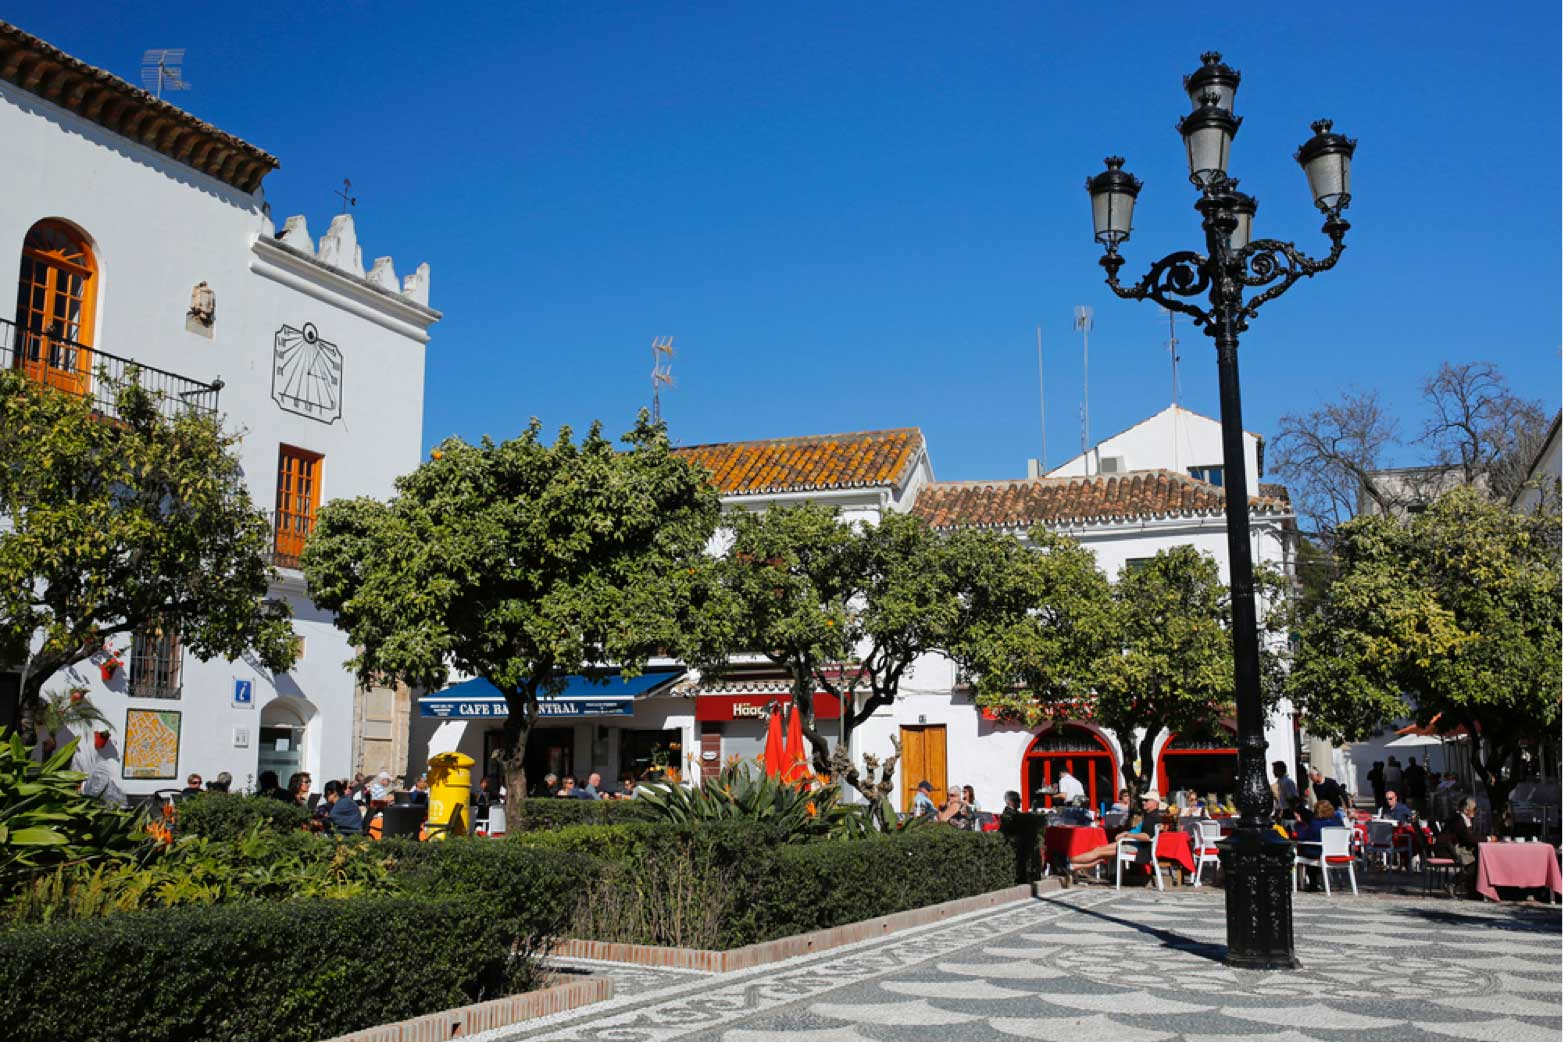 meer Marbella, Vastgoed Marbella. MPM consultants meer over Marbella